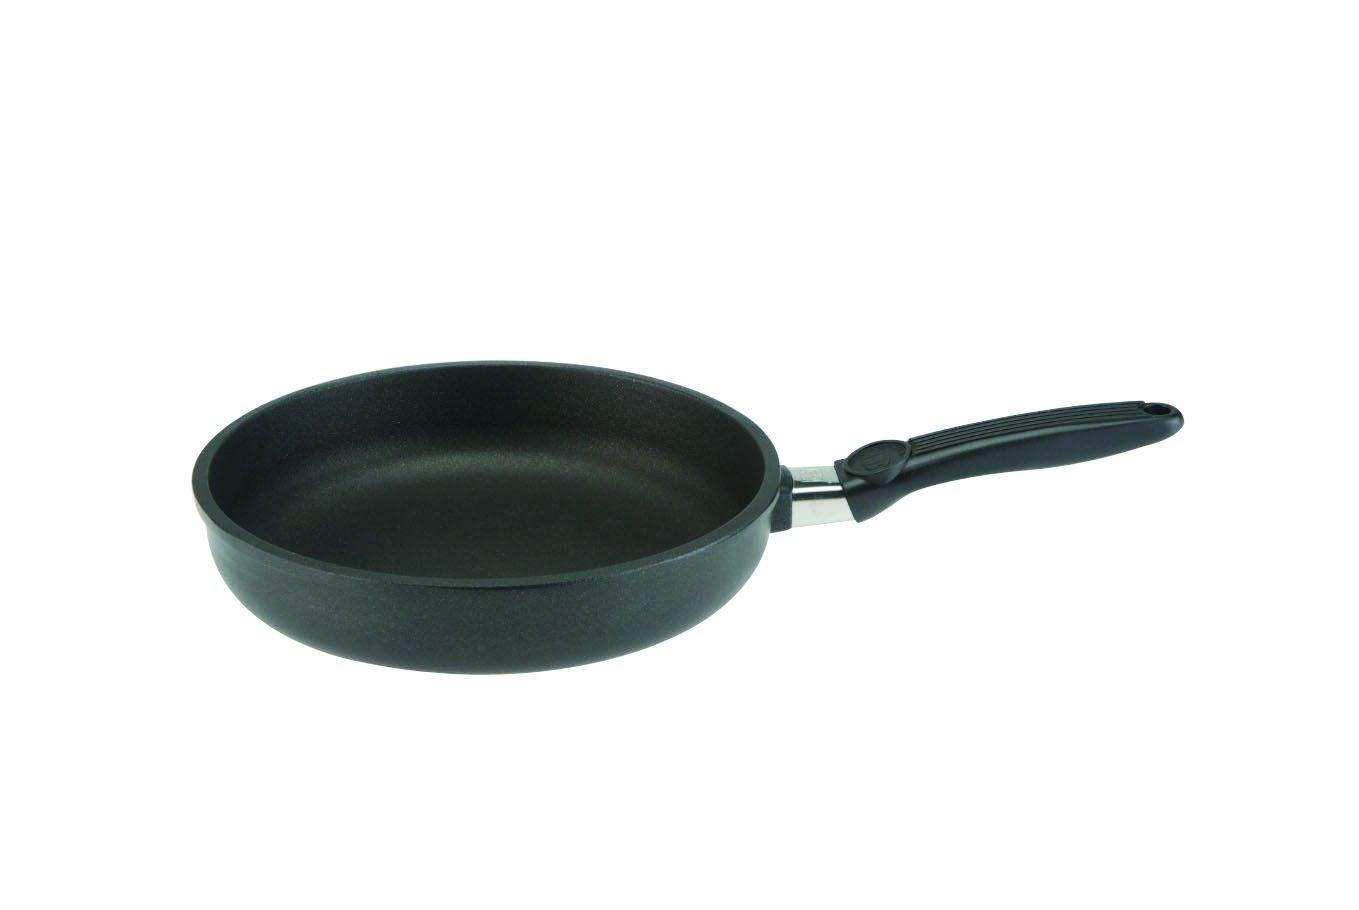 SKK 8520 Premium Plus Deep Frypan Frying pan With Detachable Handle 24x5.5cm/9.5x2.25''